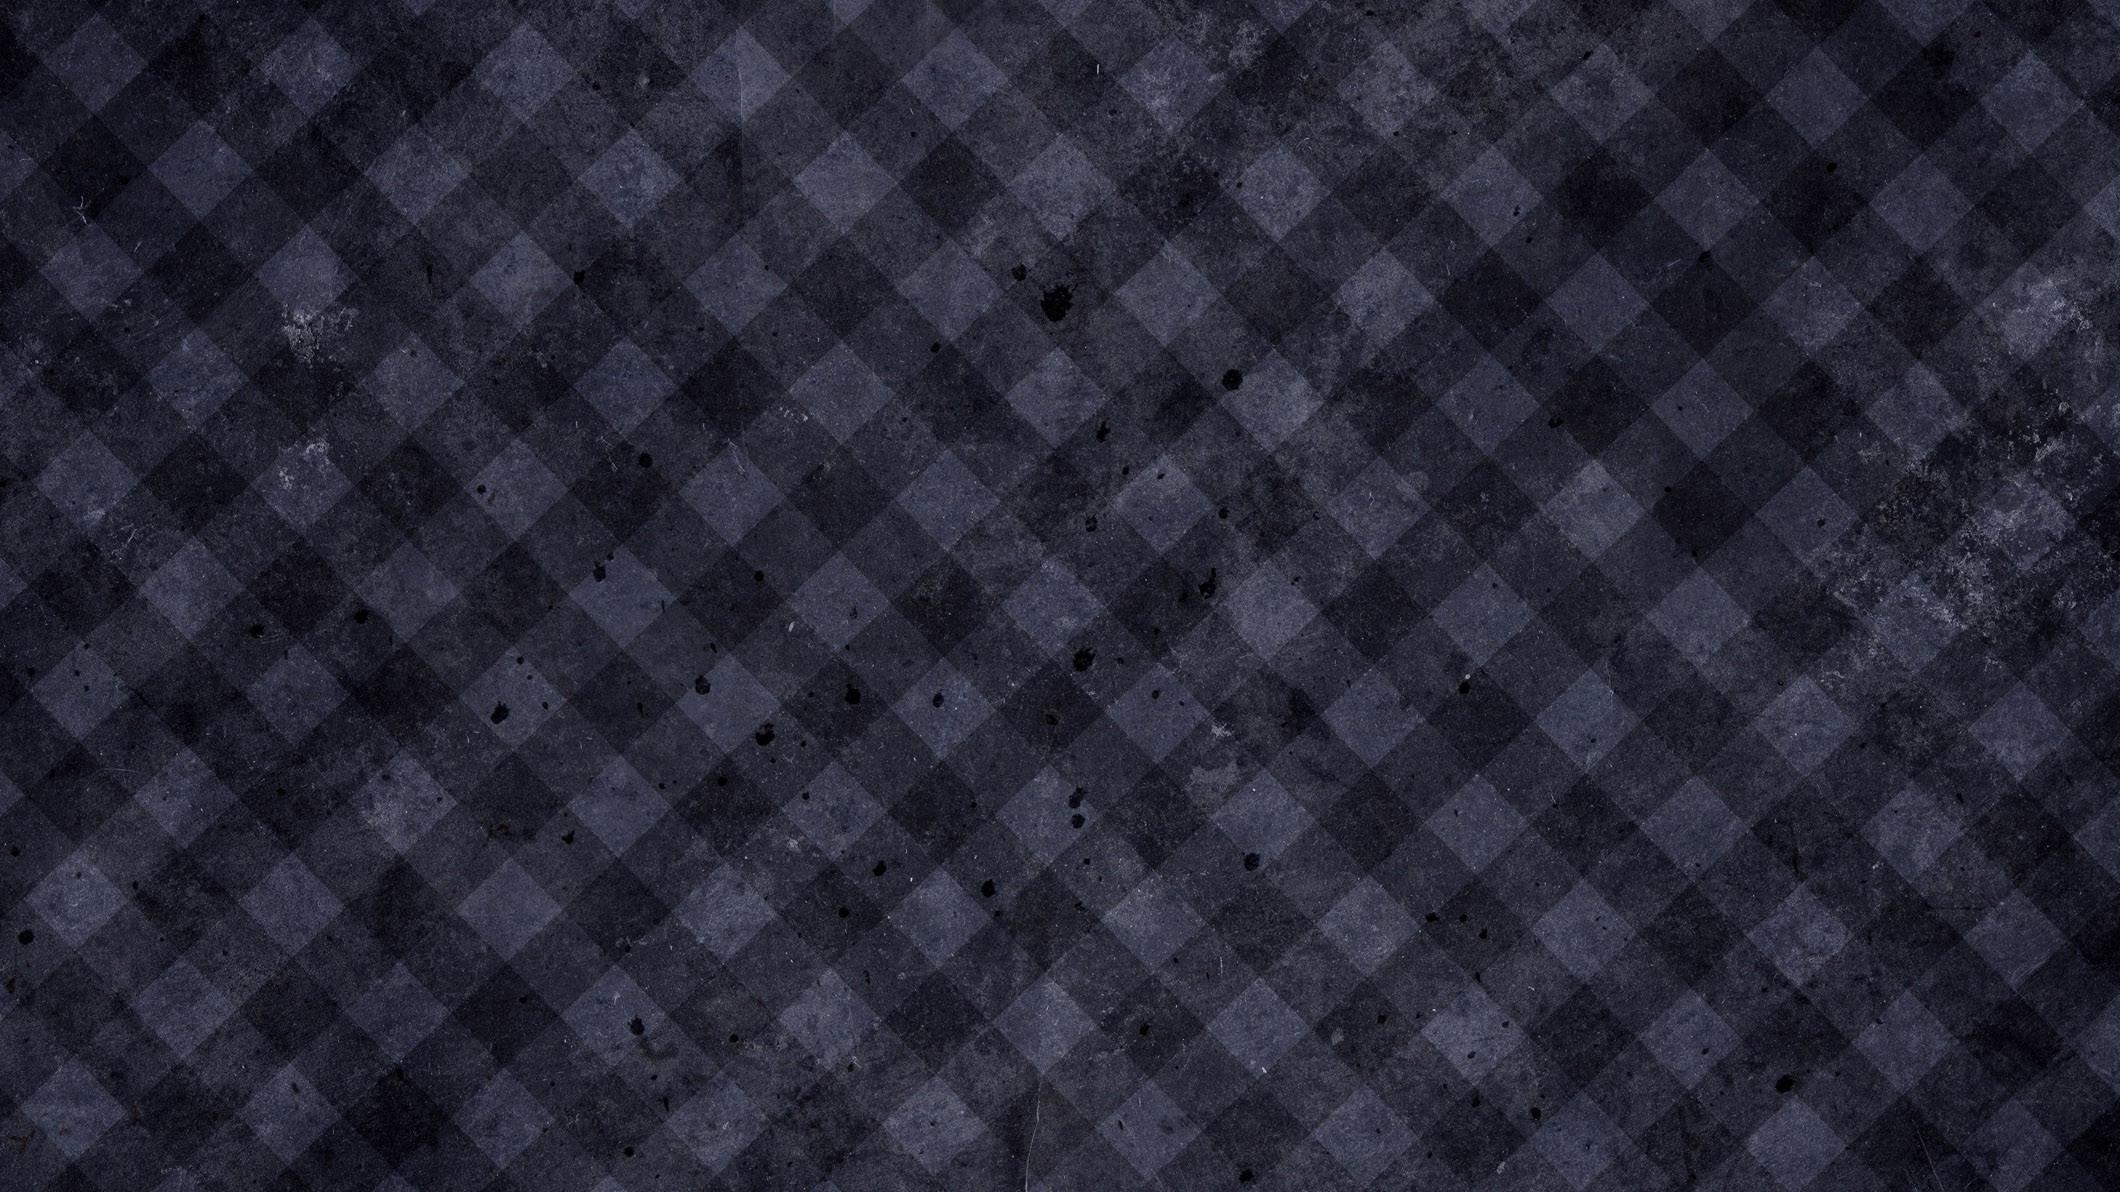 https://yourtubetheme.com/wp-content/uploads/2013/04/Square-Texture-YouTube- Channel-Art.jpg | Texture | Pinterest